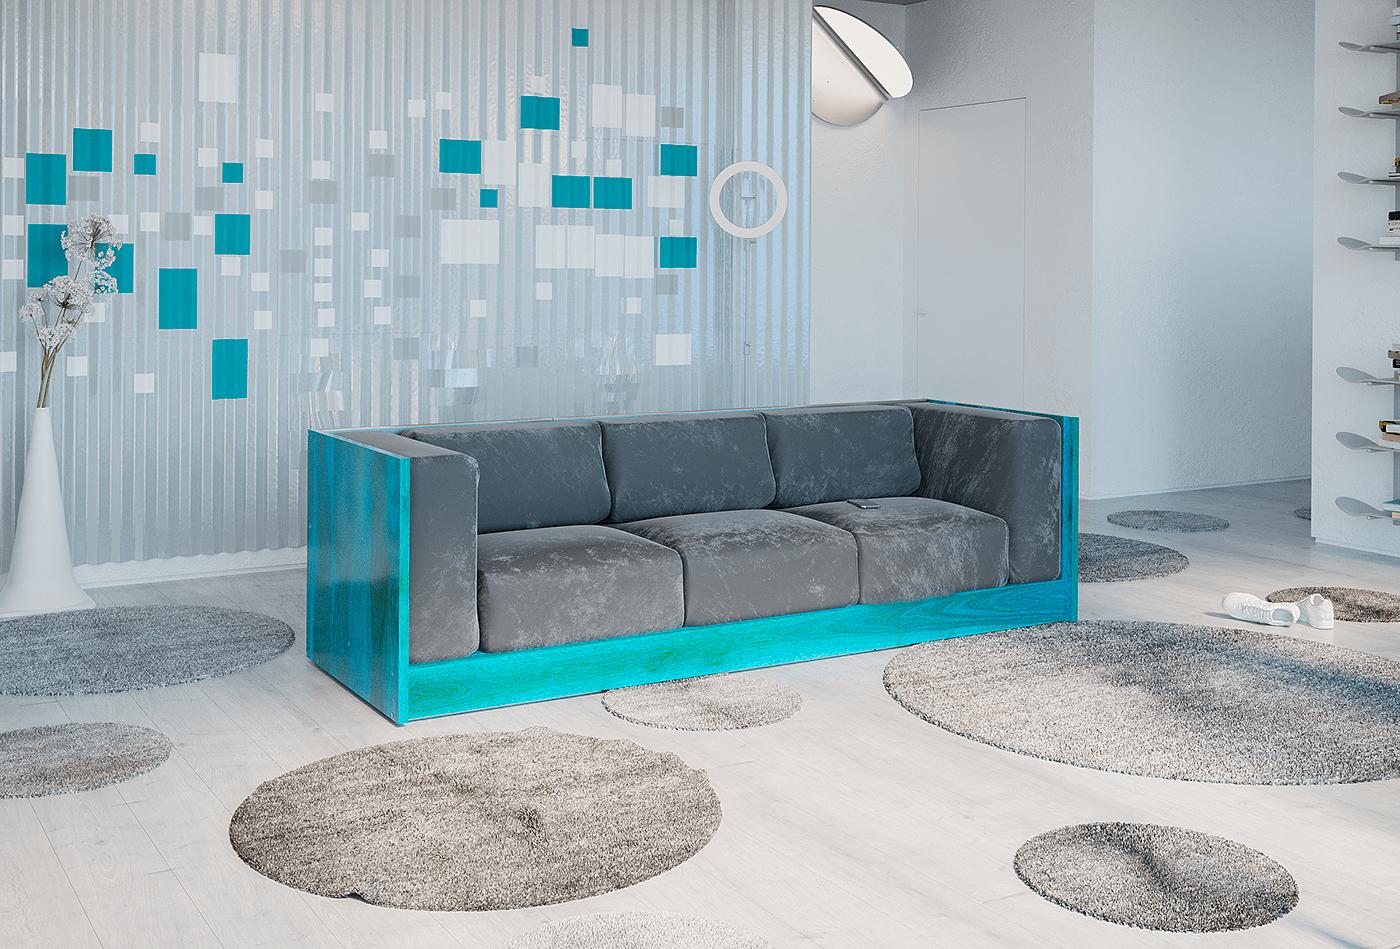 desgn gray sofa turquoise wood